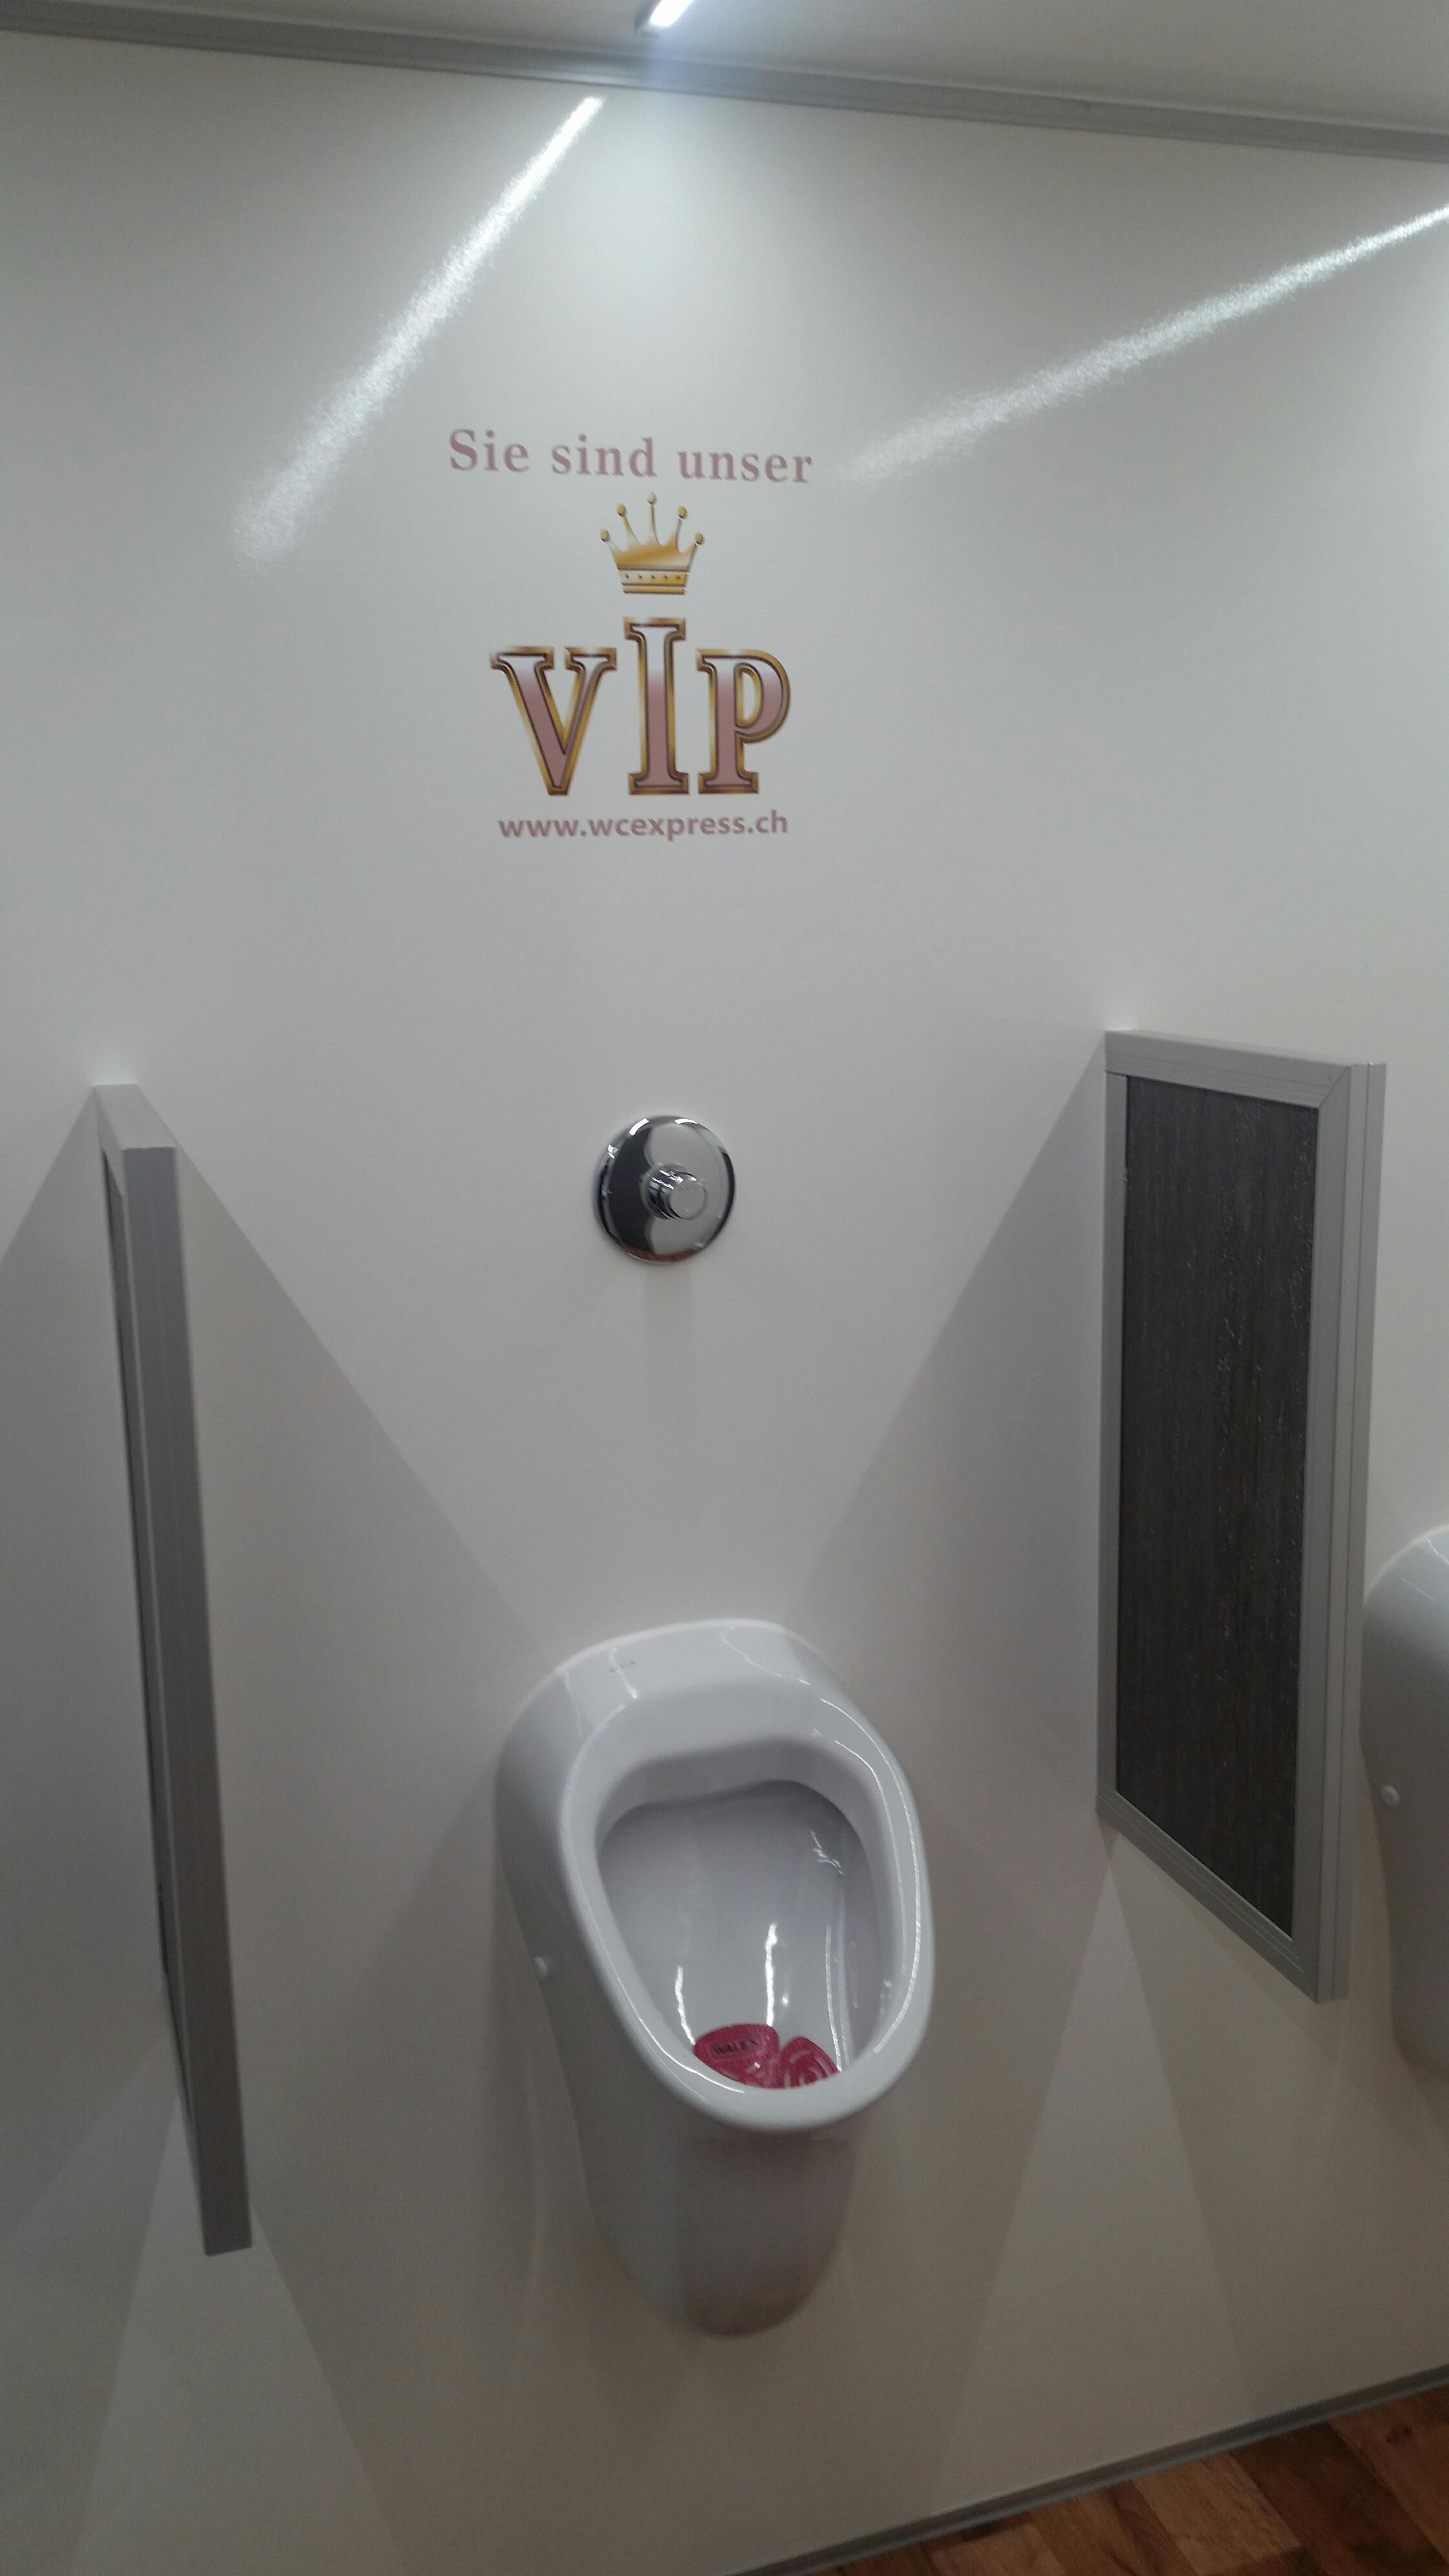 VIP WC-Wagen_Juni 2016_1